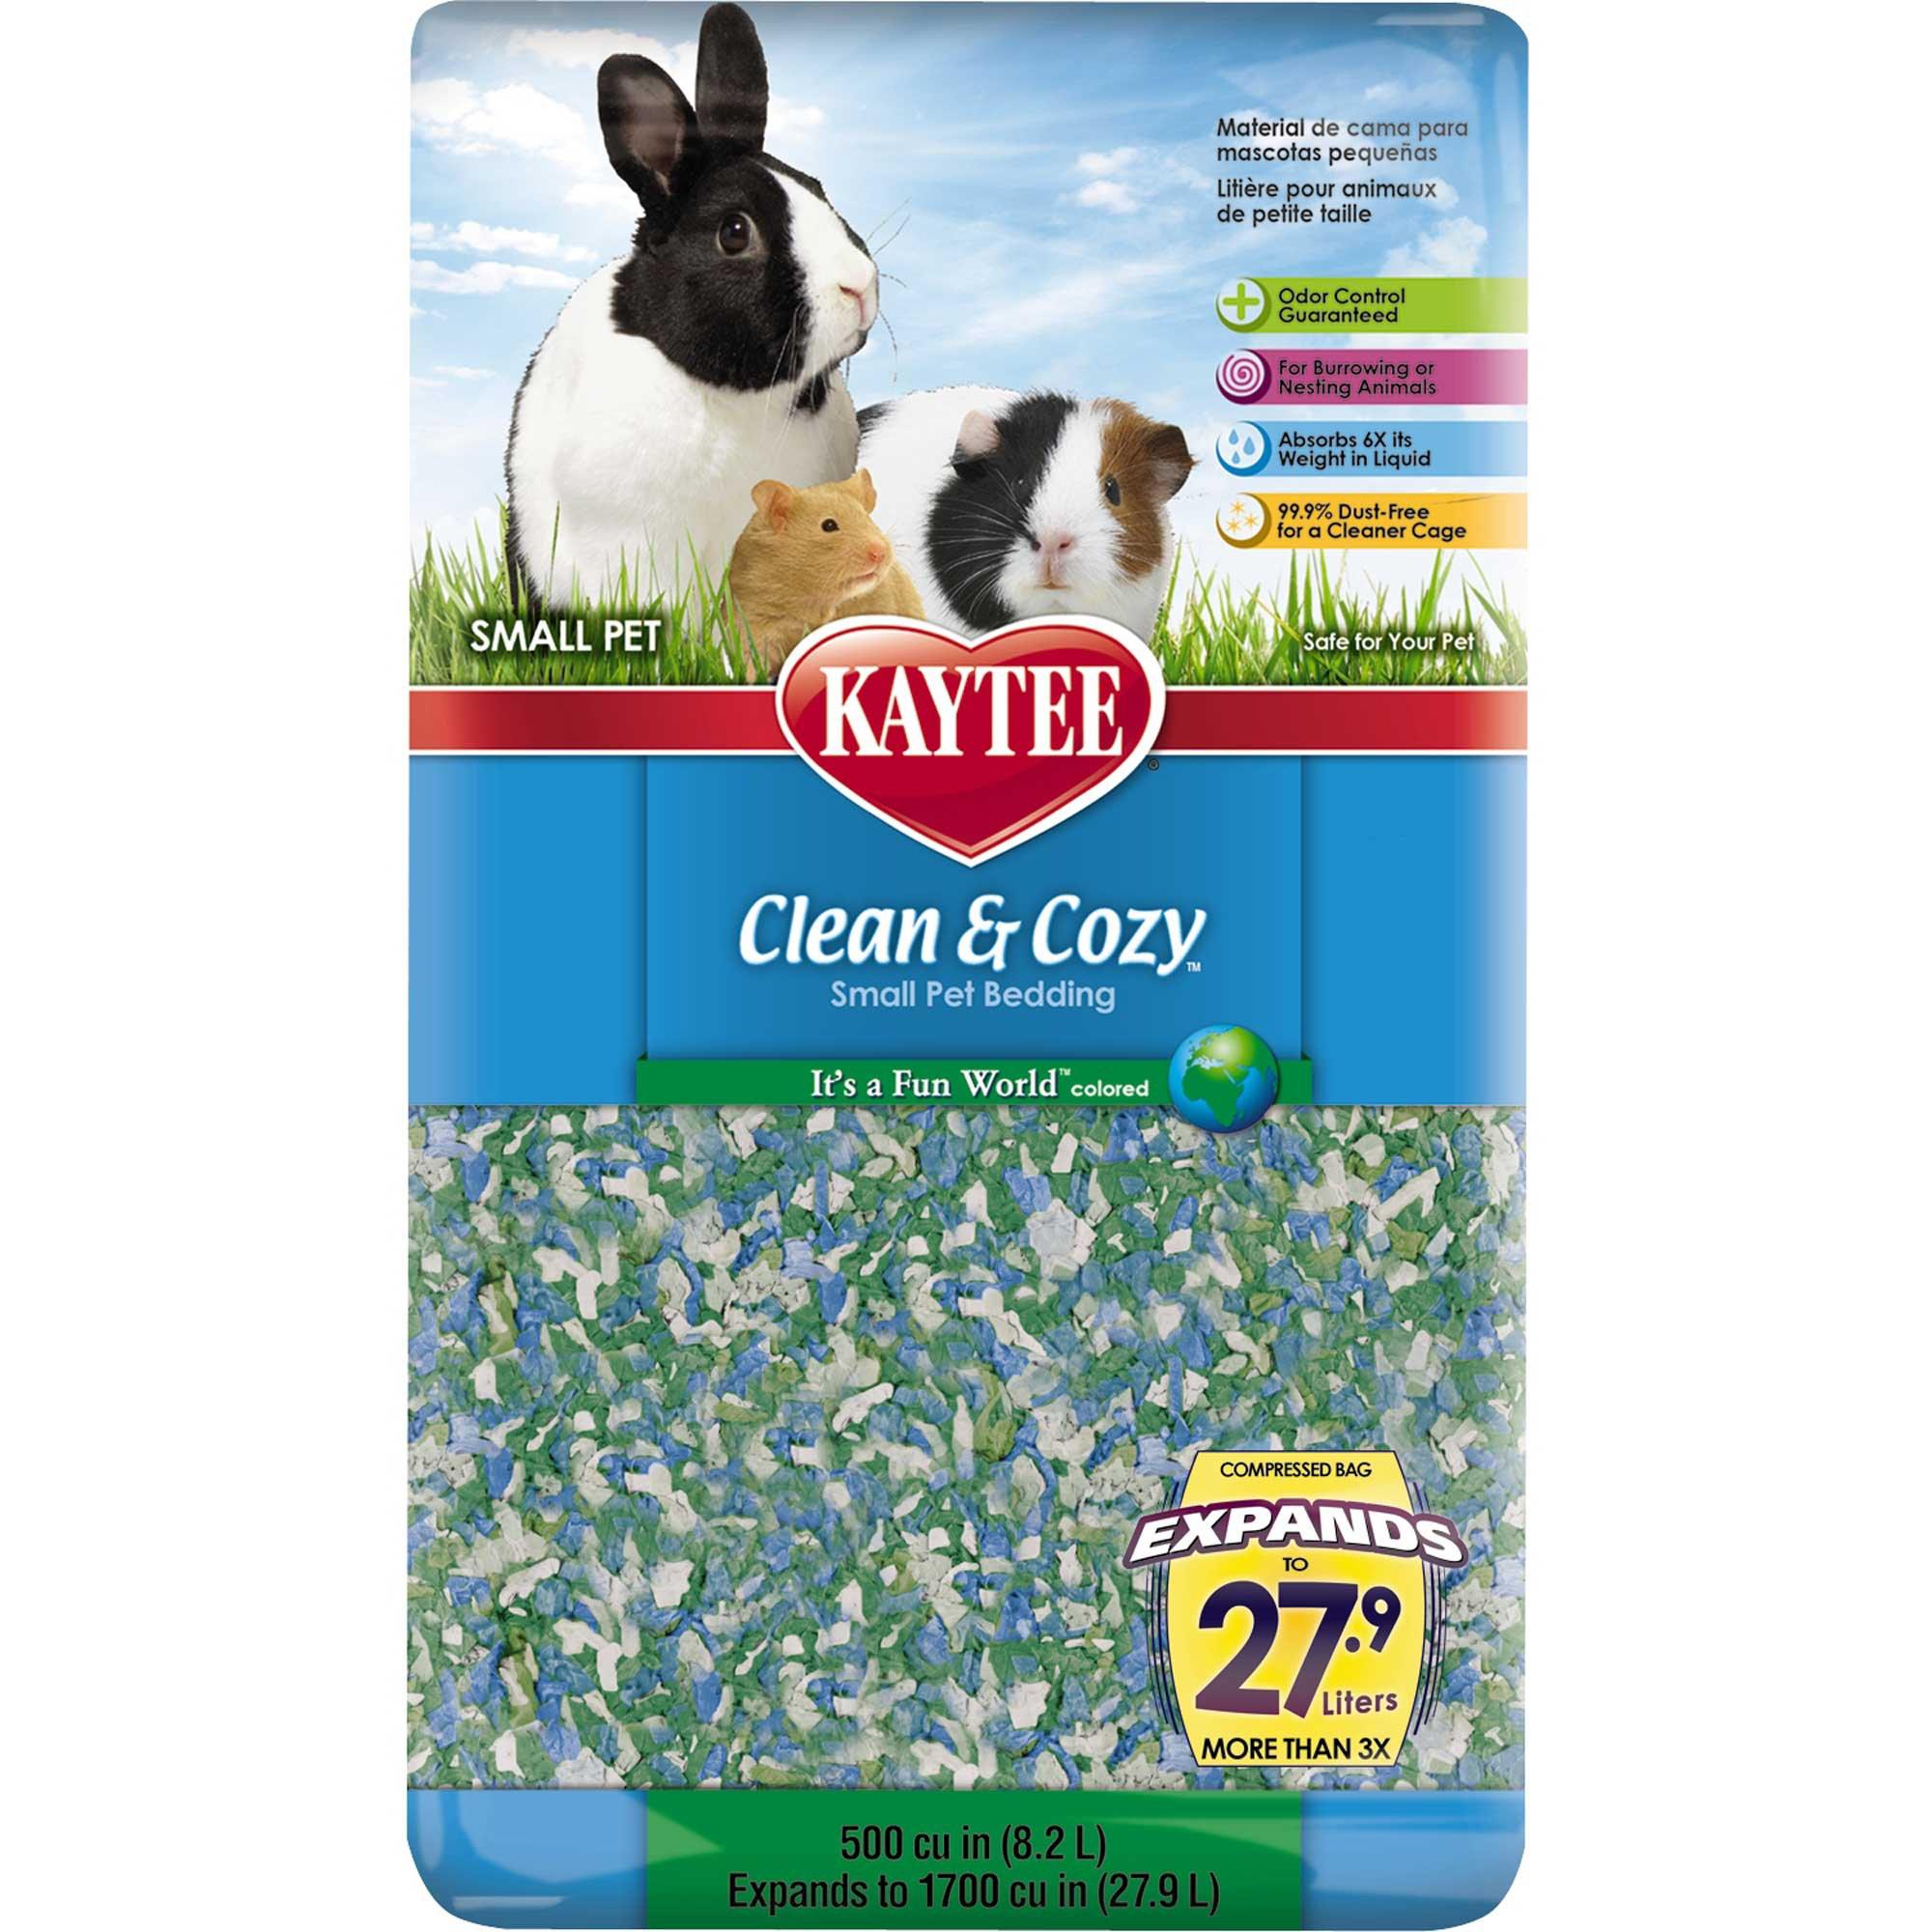 Kaytee Clean & Cozy It's A Fun World Small Animal Bedding